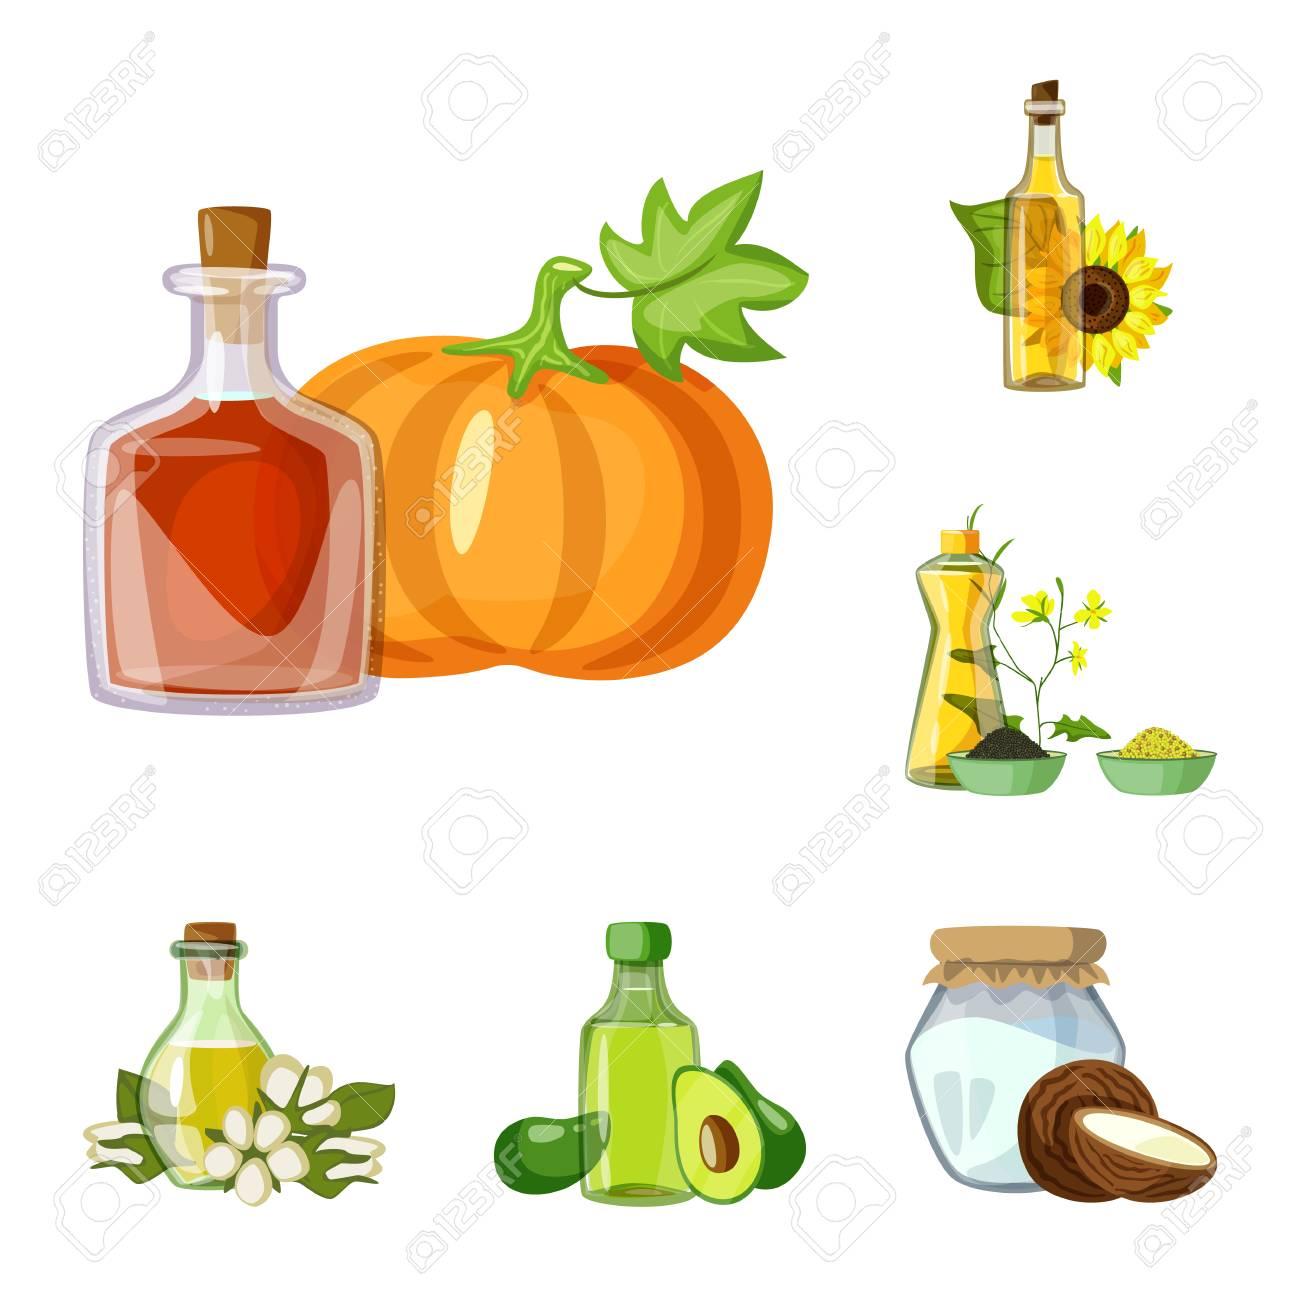 Vector illustration of bottle and glass symbol. Set of bottle and agriculture stock vector illustration. - 117911318